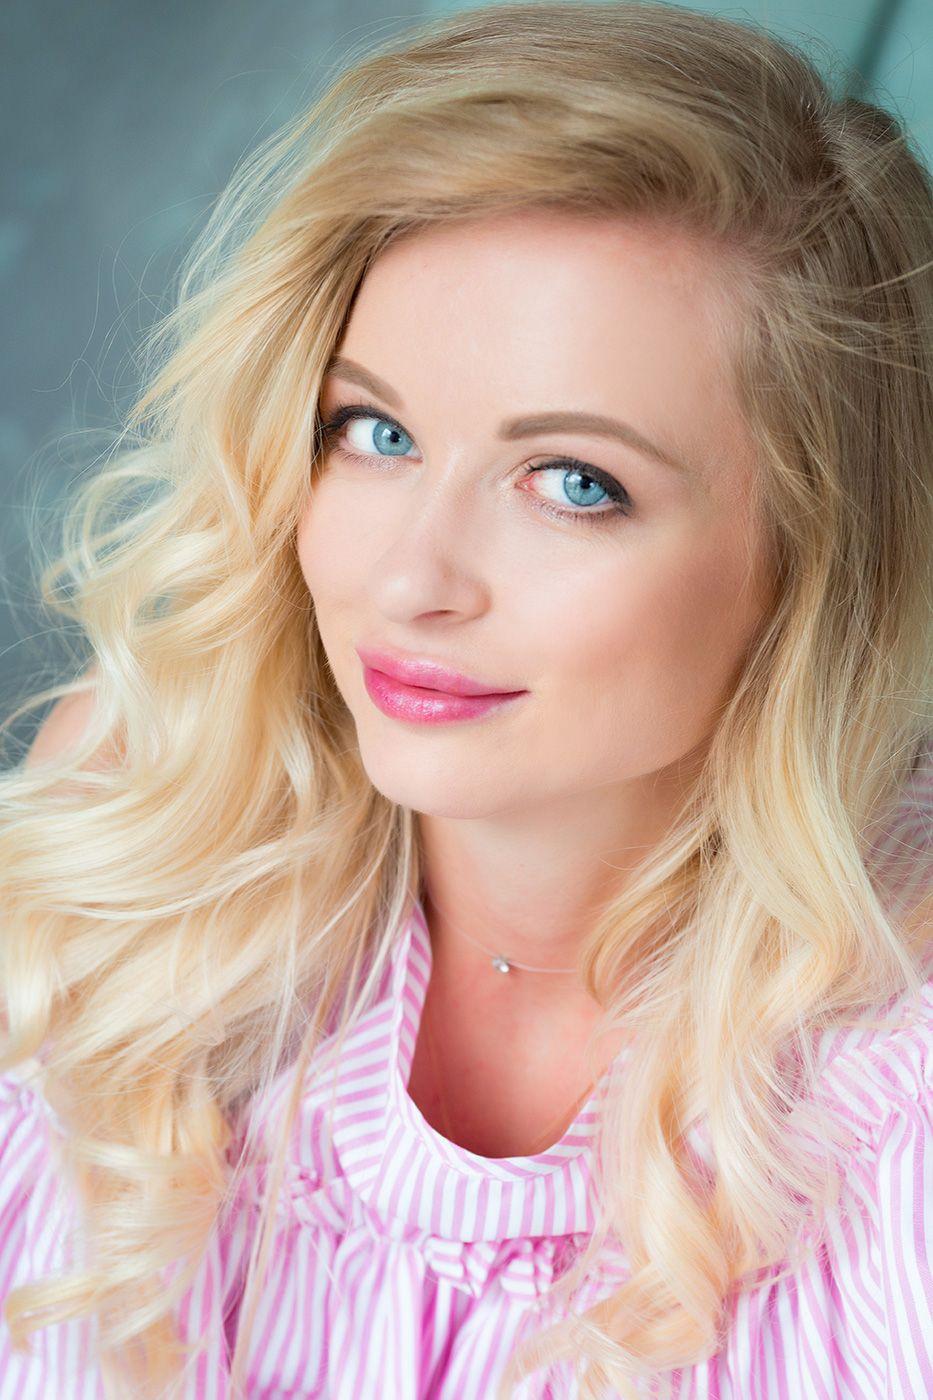 Agence matrimoniale rencontre de Ksenia  femme célibataire de 34 ans, Aléria.